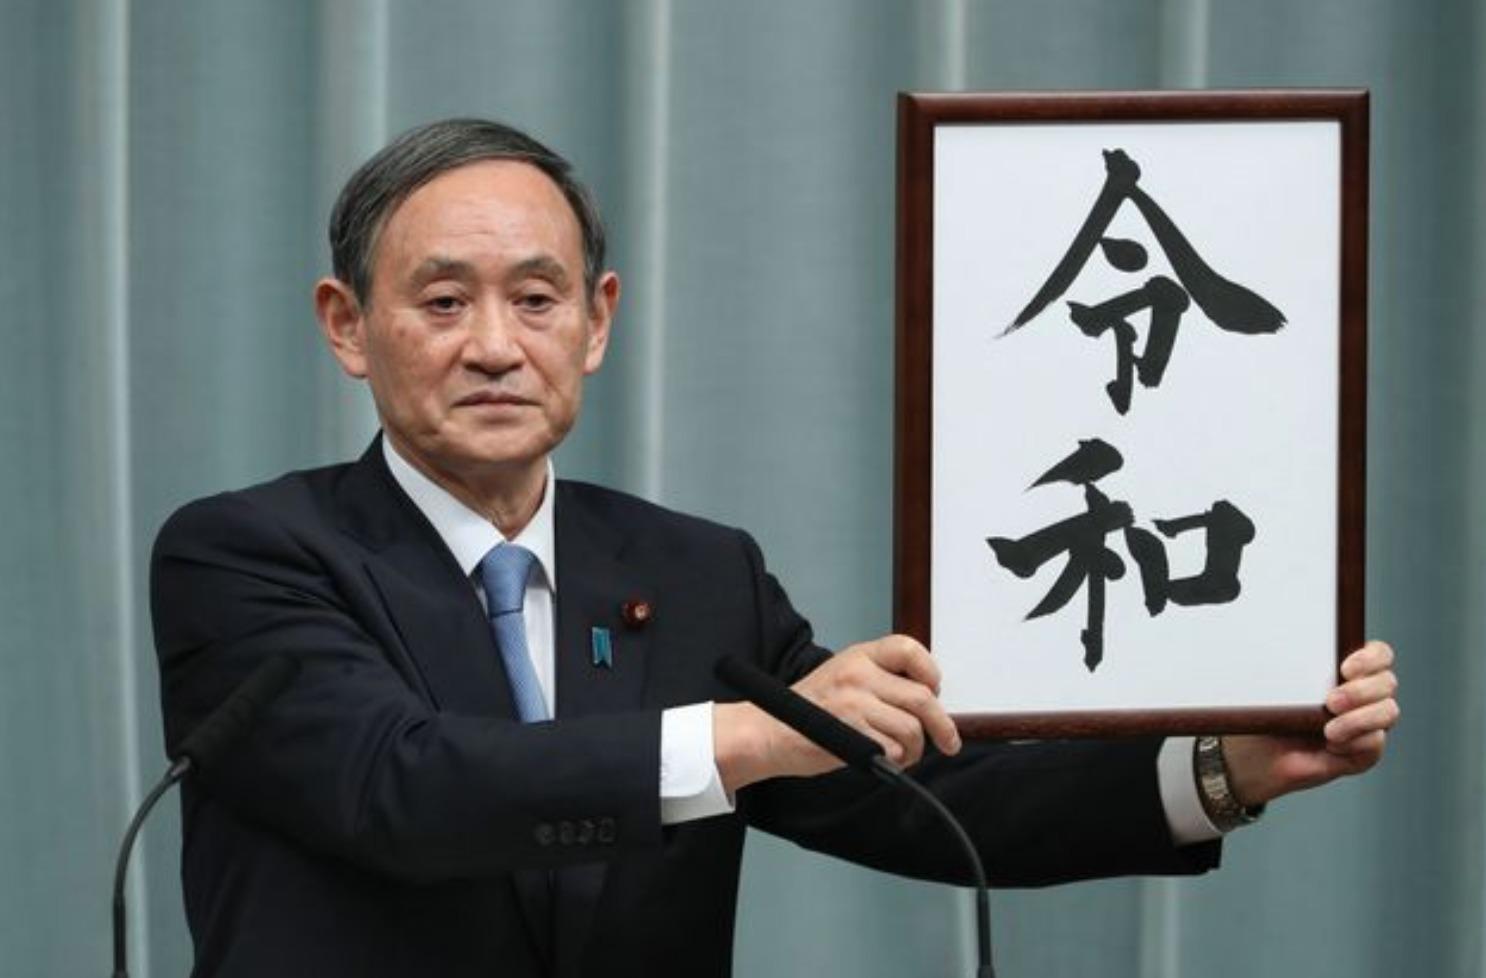 令和の総理大臣・菅義偉の名語録・名言集